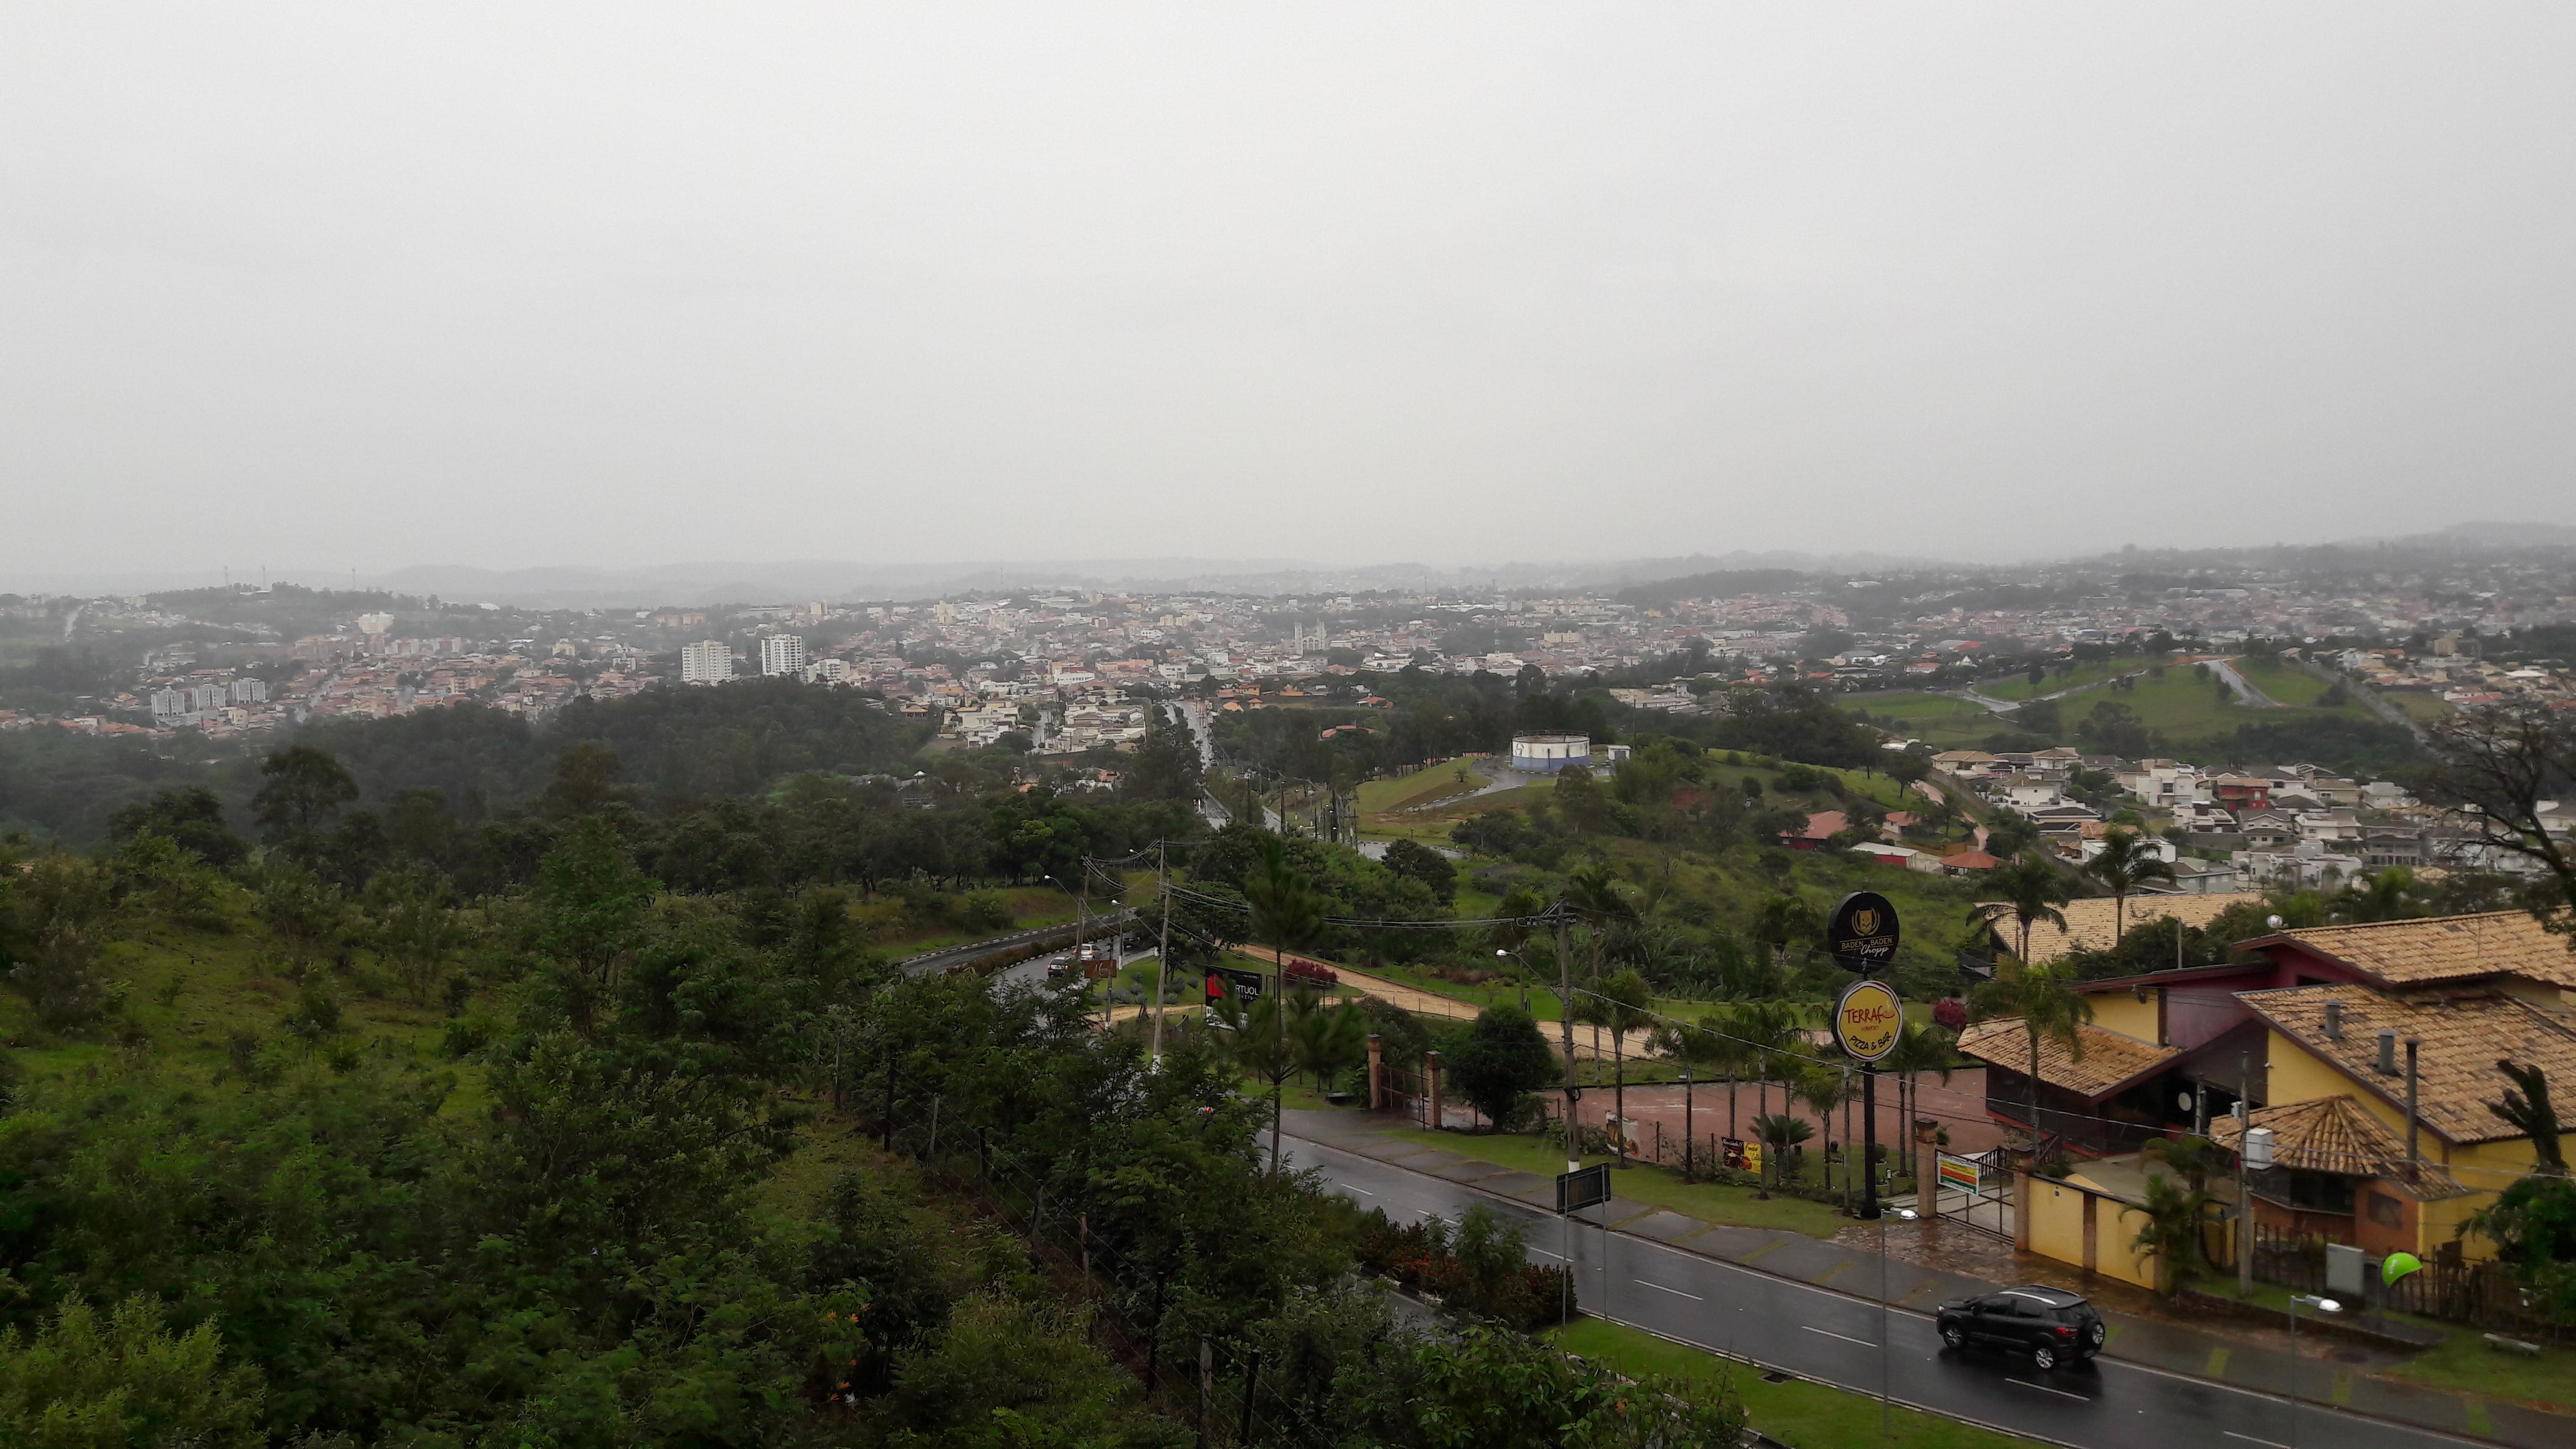 Vinhedo SP mirador view of city may17